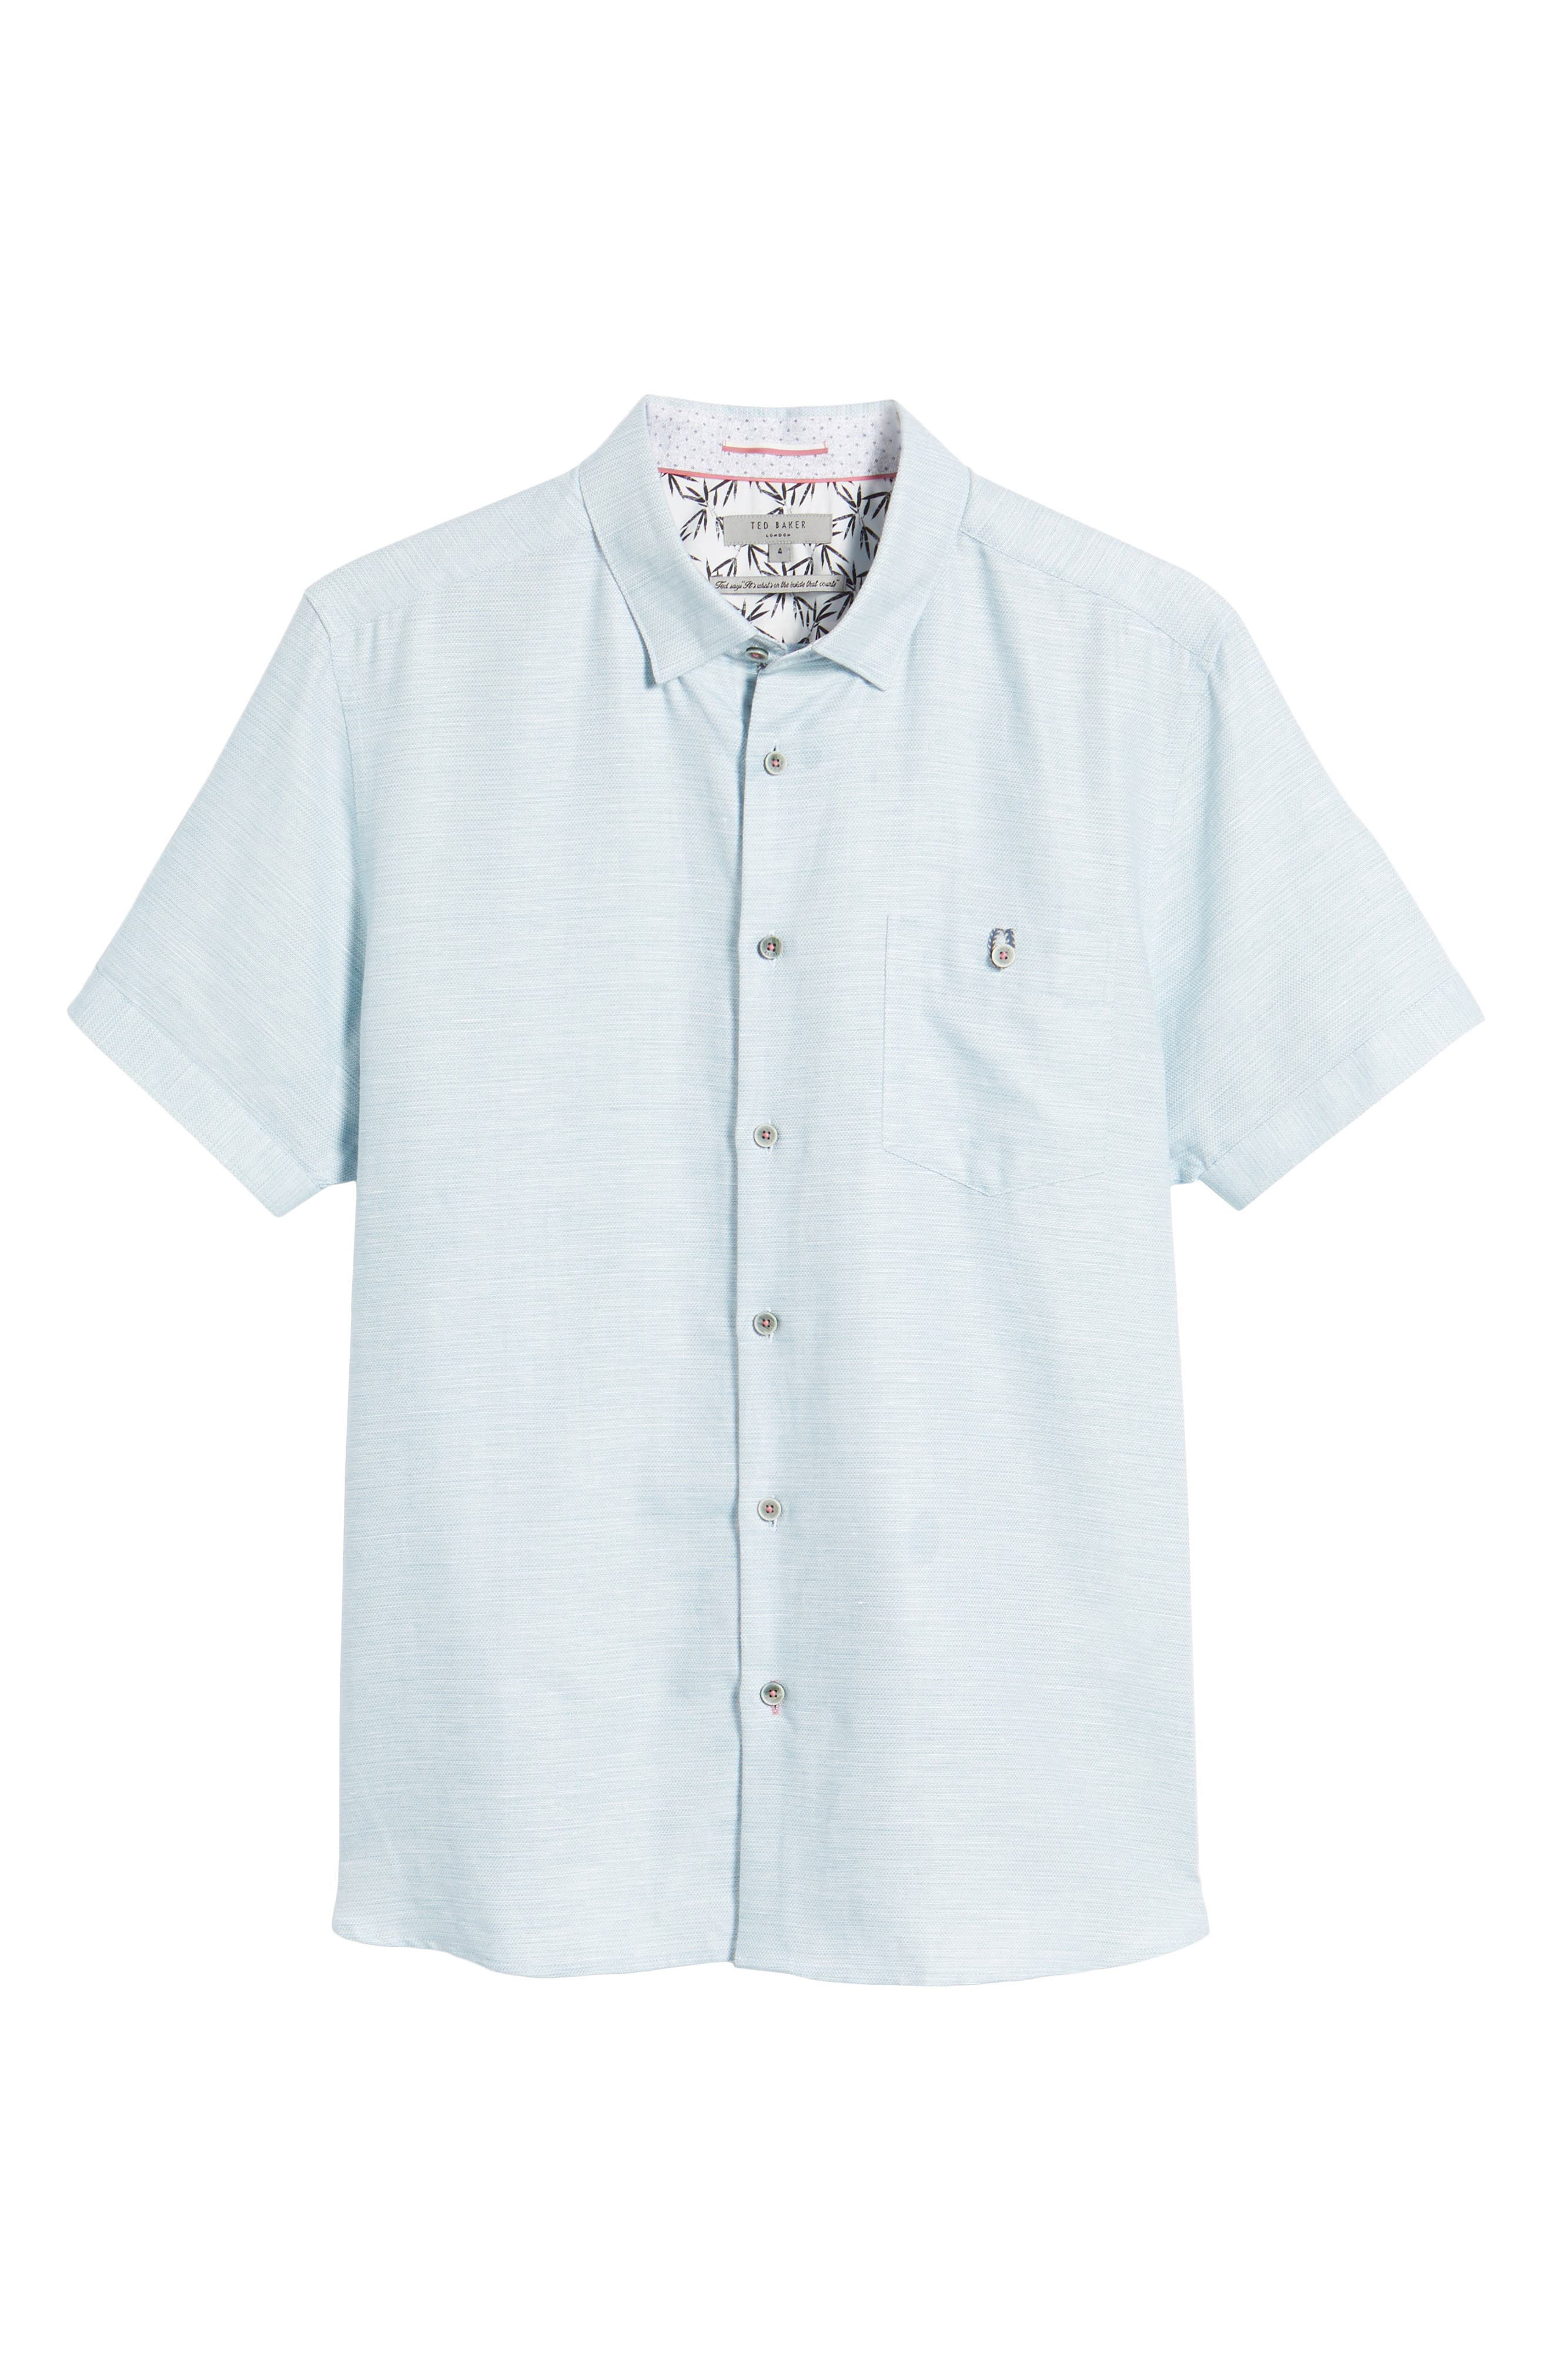 Peezett Short Sleeve Sport Shirt,                             Alternate thumbnail 6, color,                             Green